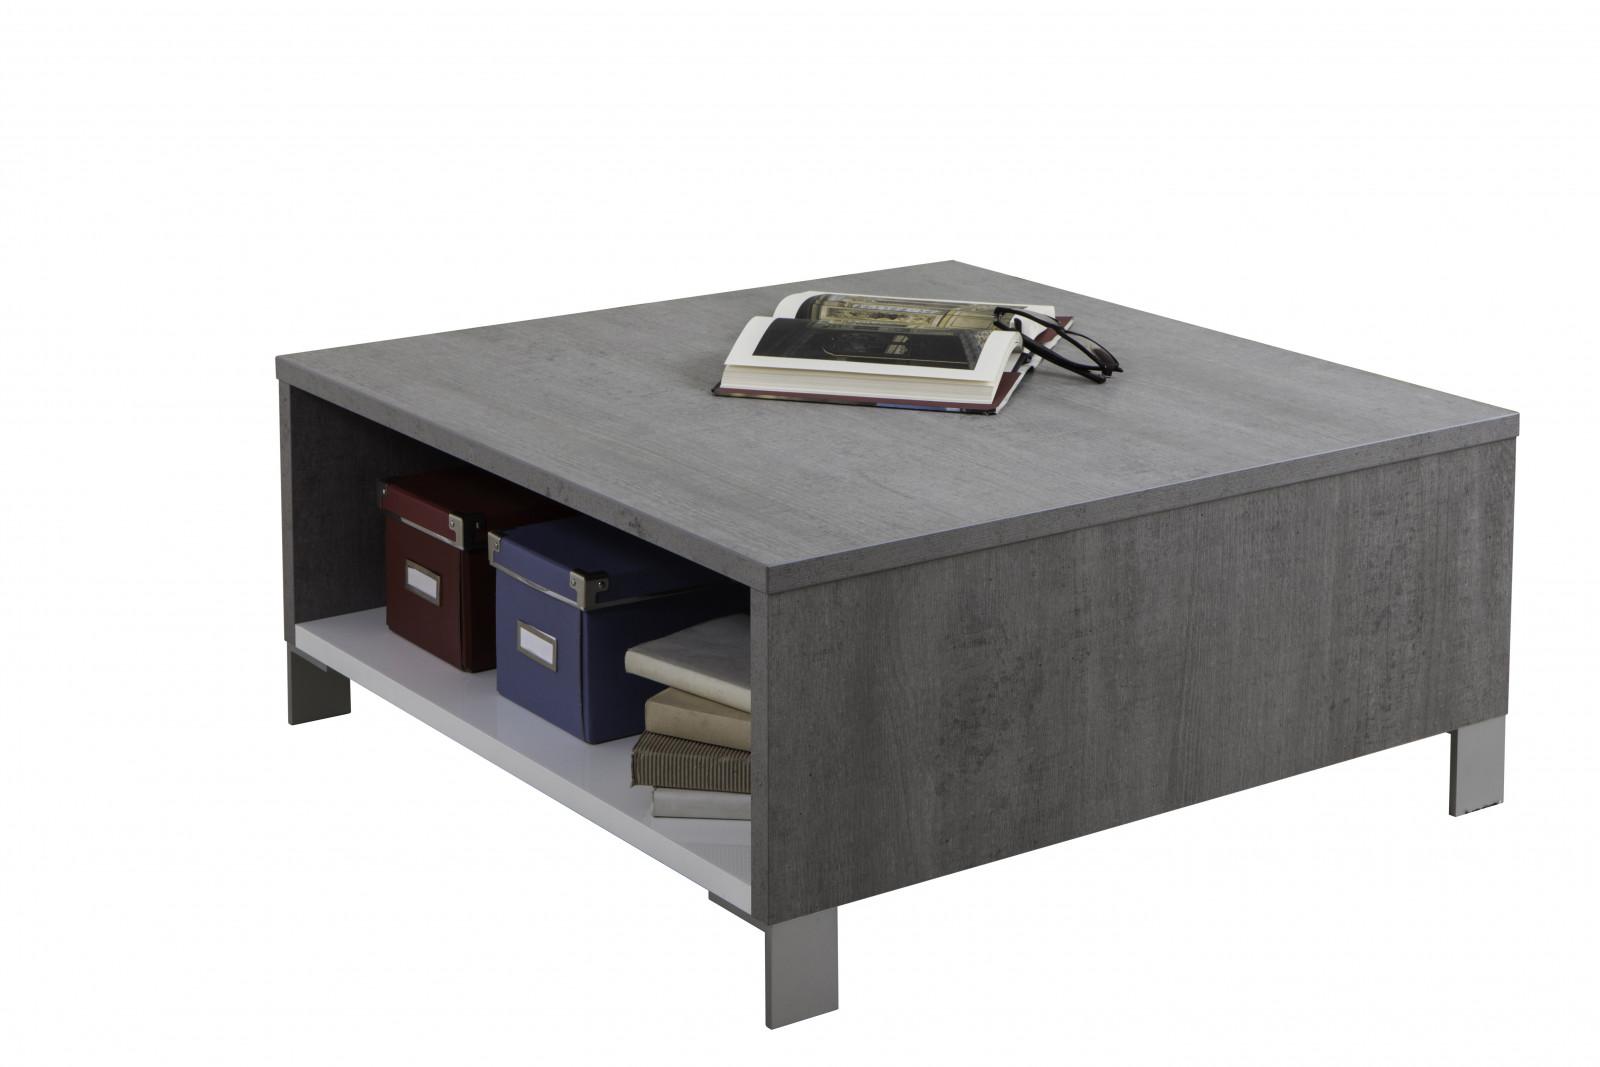 Basse ® Basse Table Table RomaBobochic RomaBobochic ® Table Basse Table RomaBobochic ® OkiPXZu